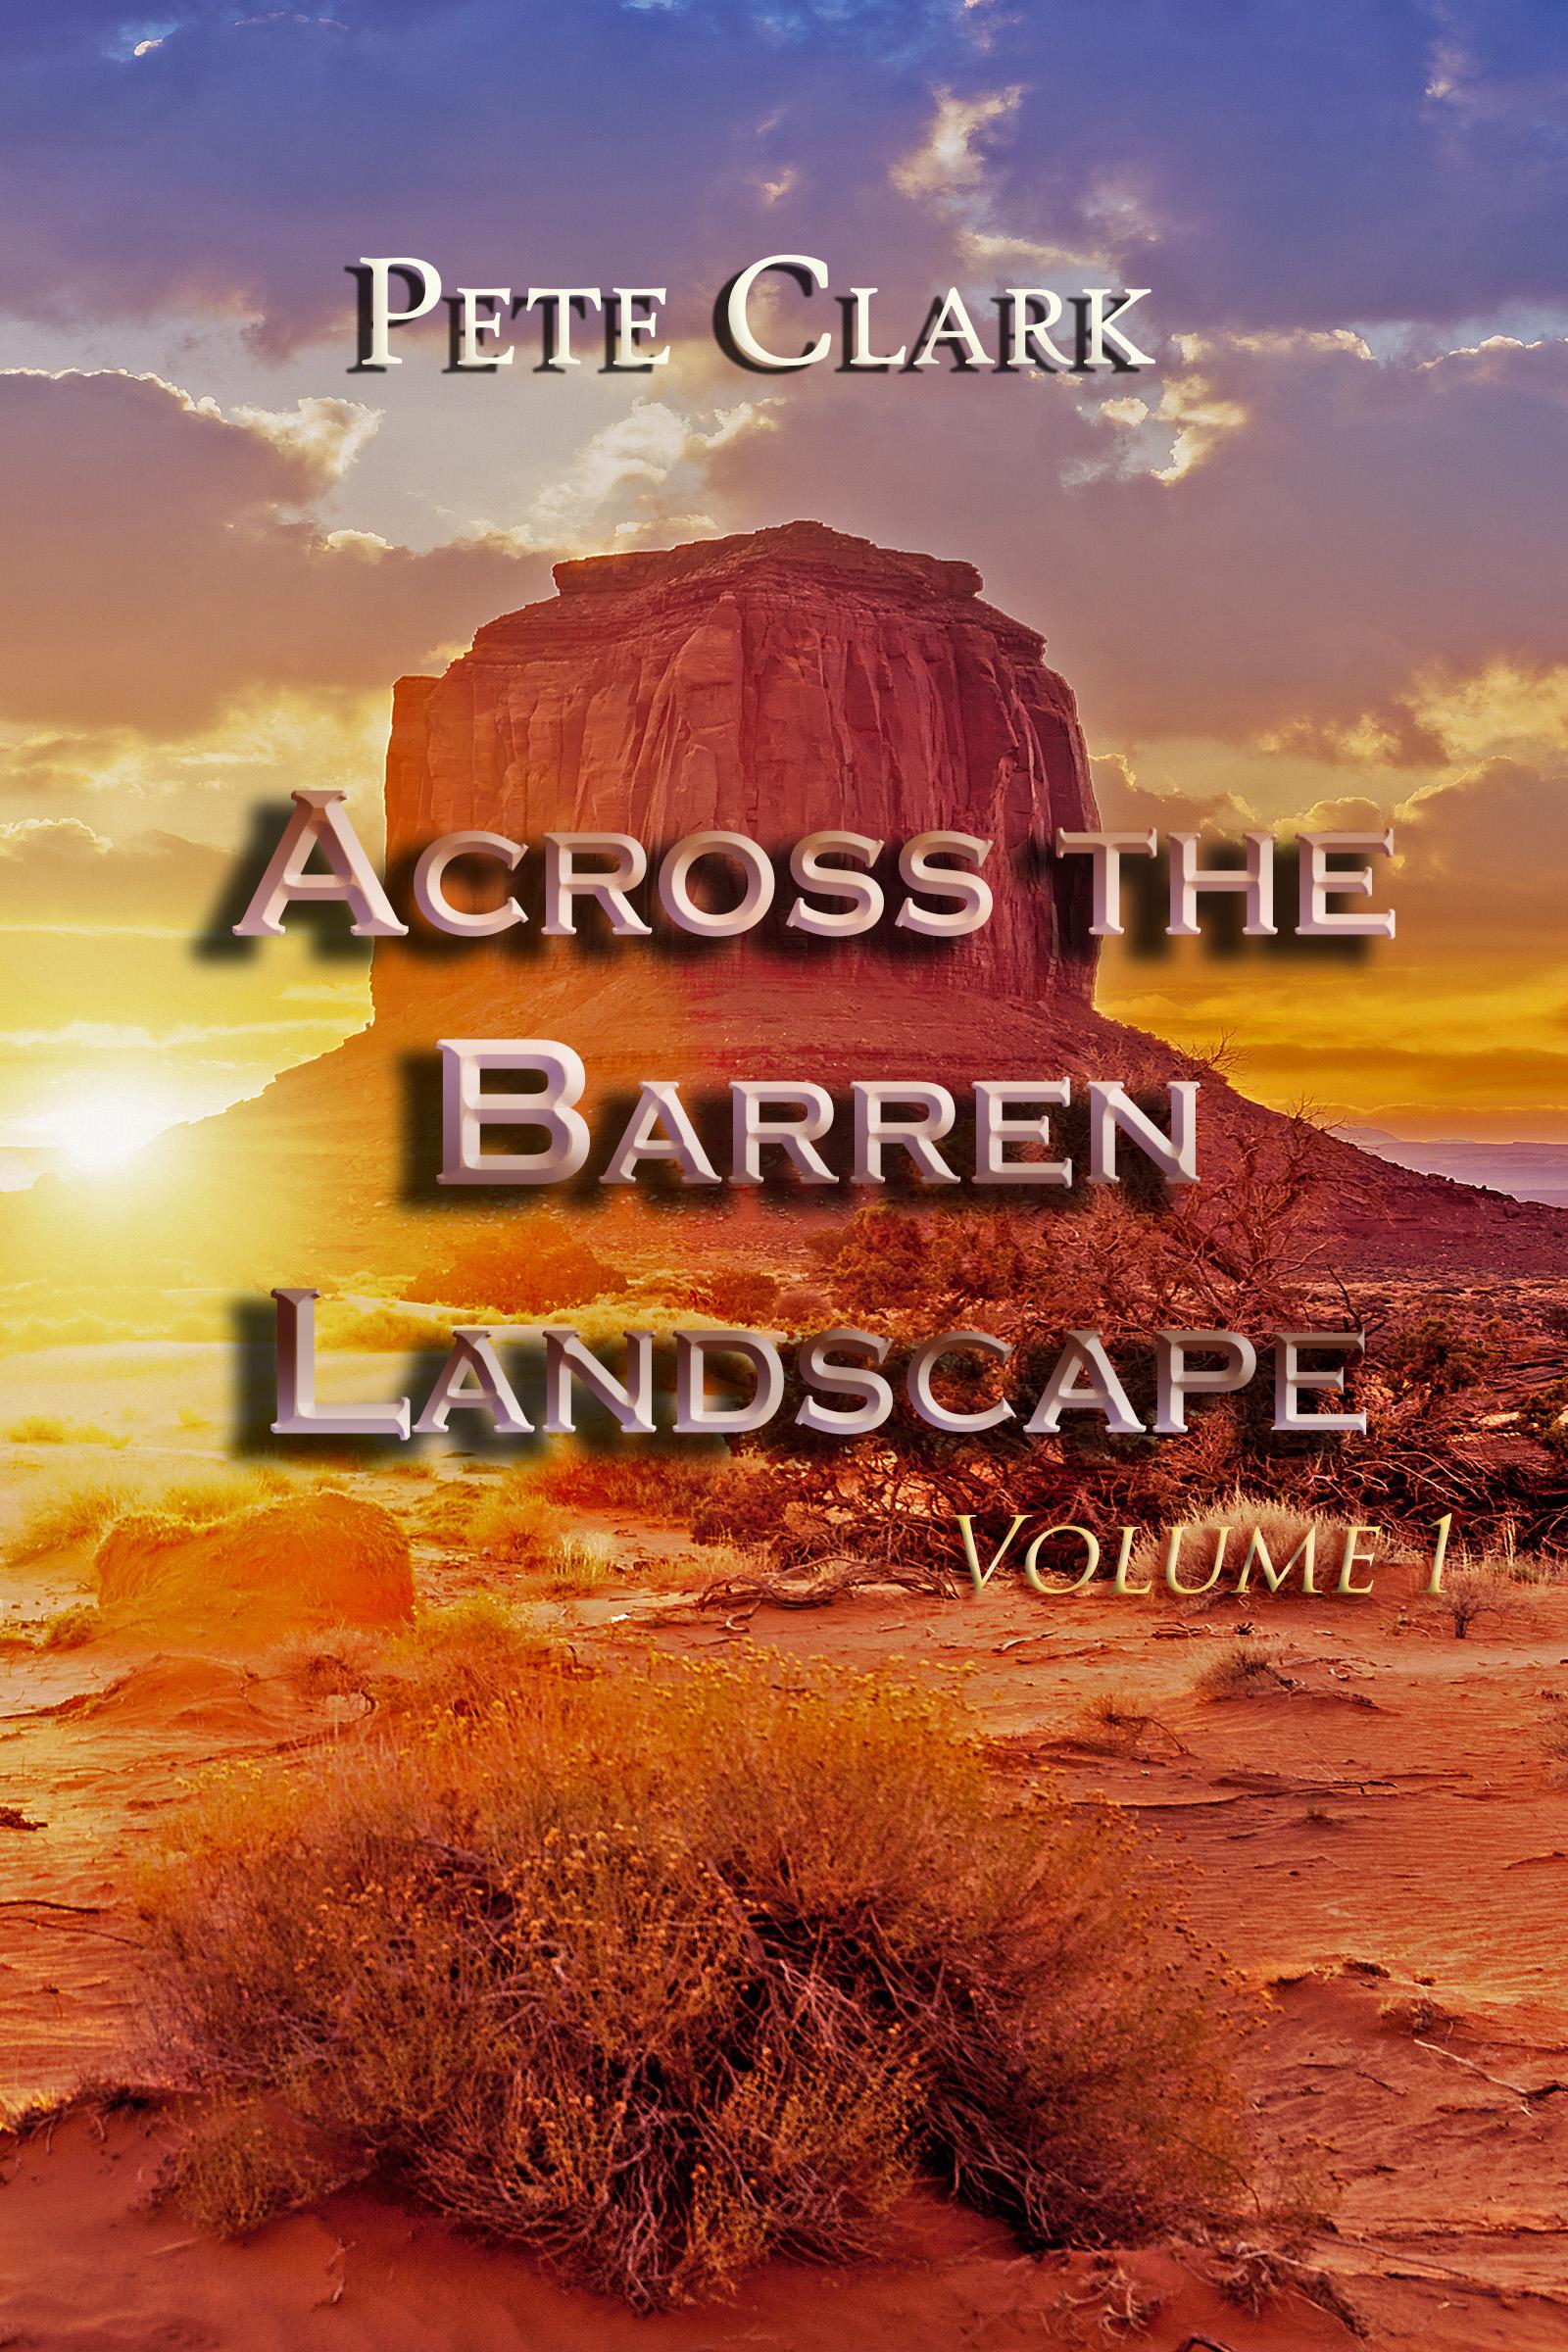 Pete Clark - Across the Barren Landscape, Volume 1